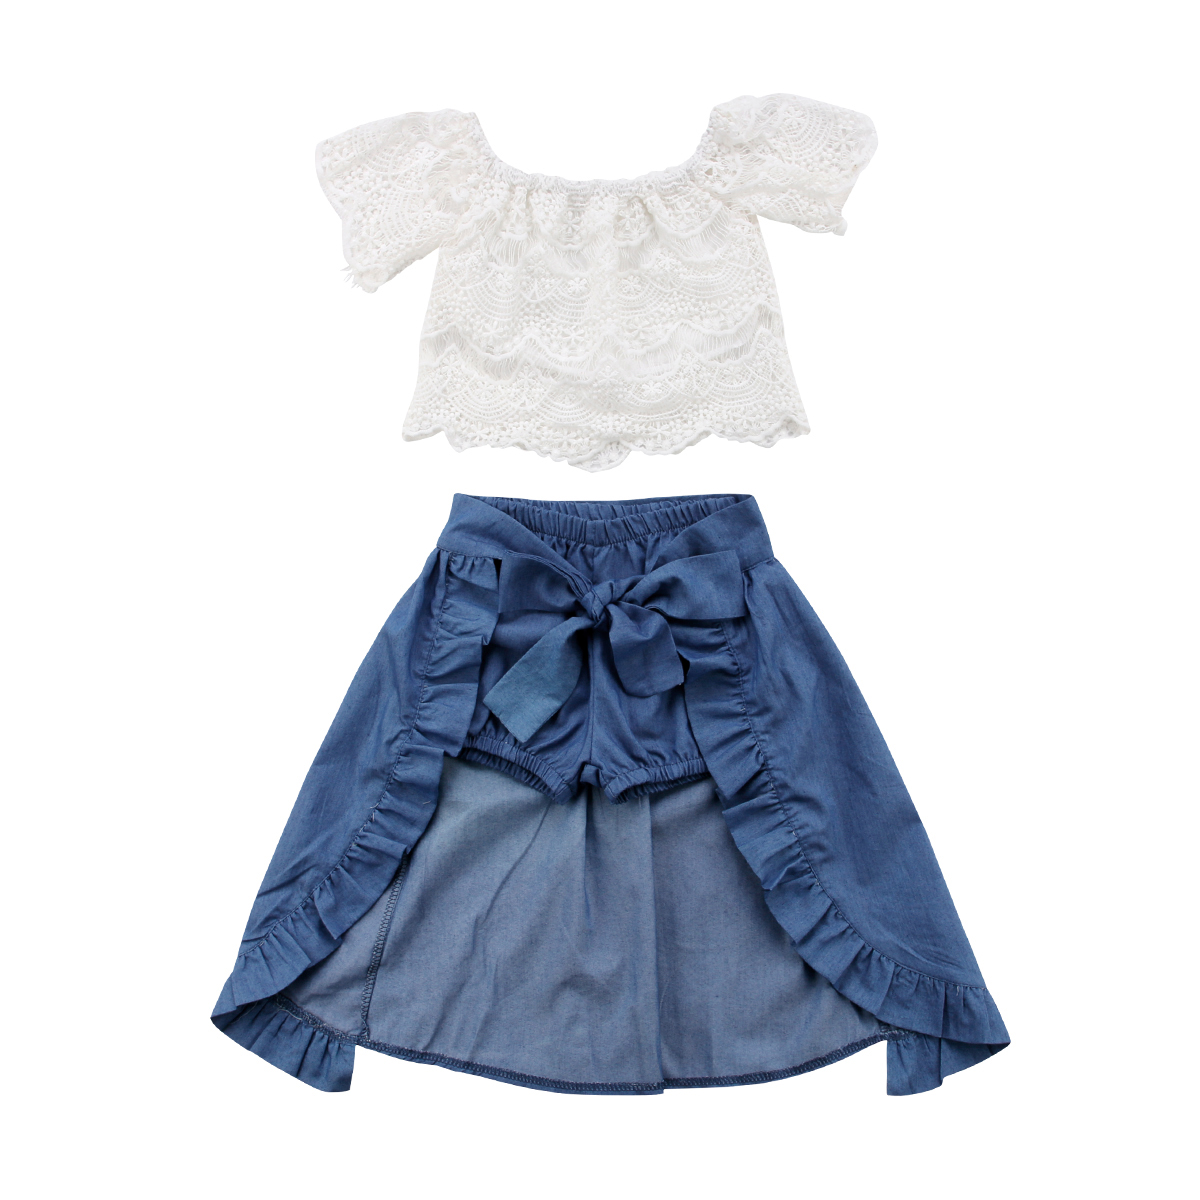 US Stock Toddler Kids Girls Ruffle Bowknot Beach Dresses Short Pants Outfit Set